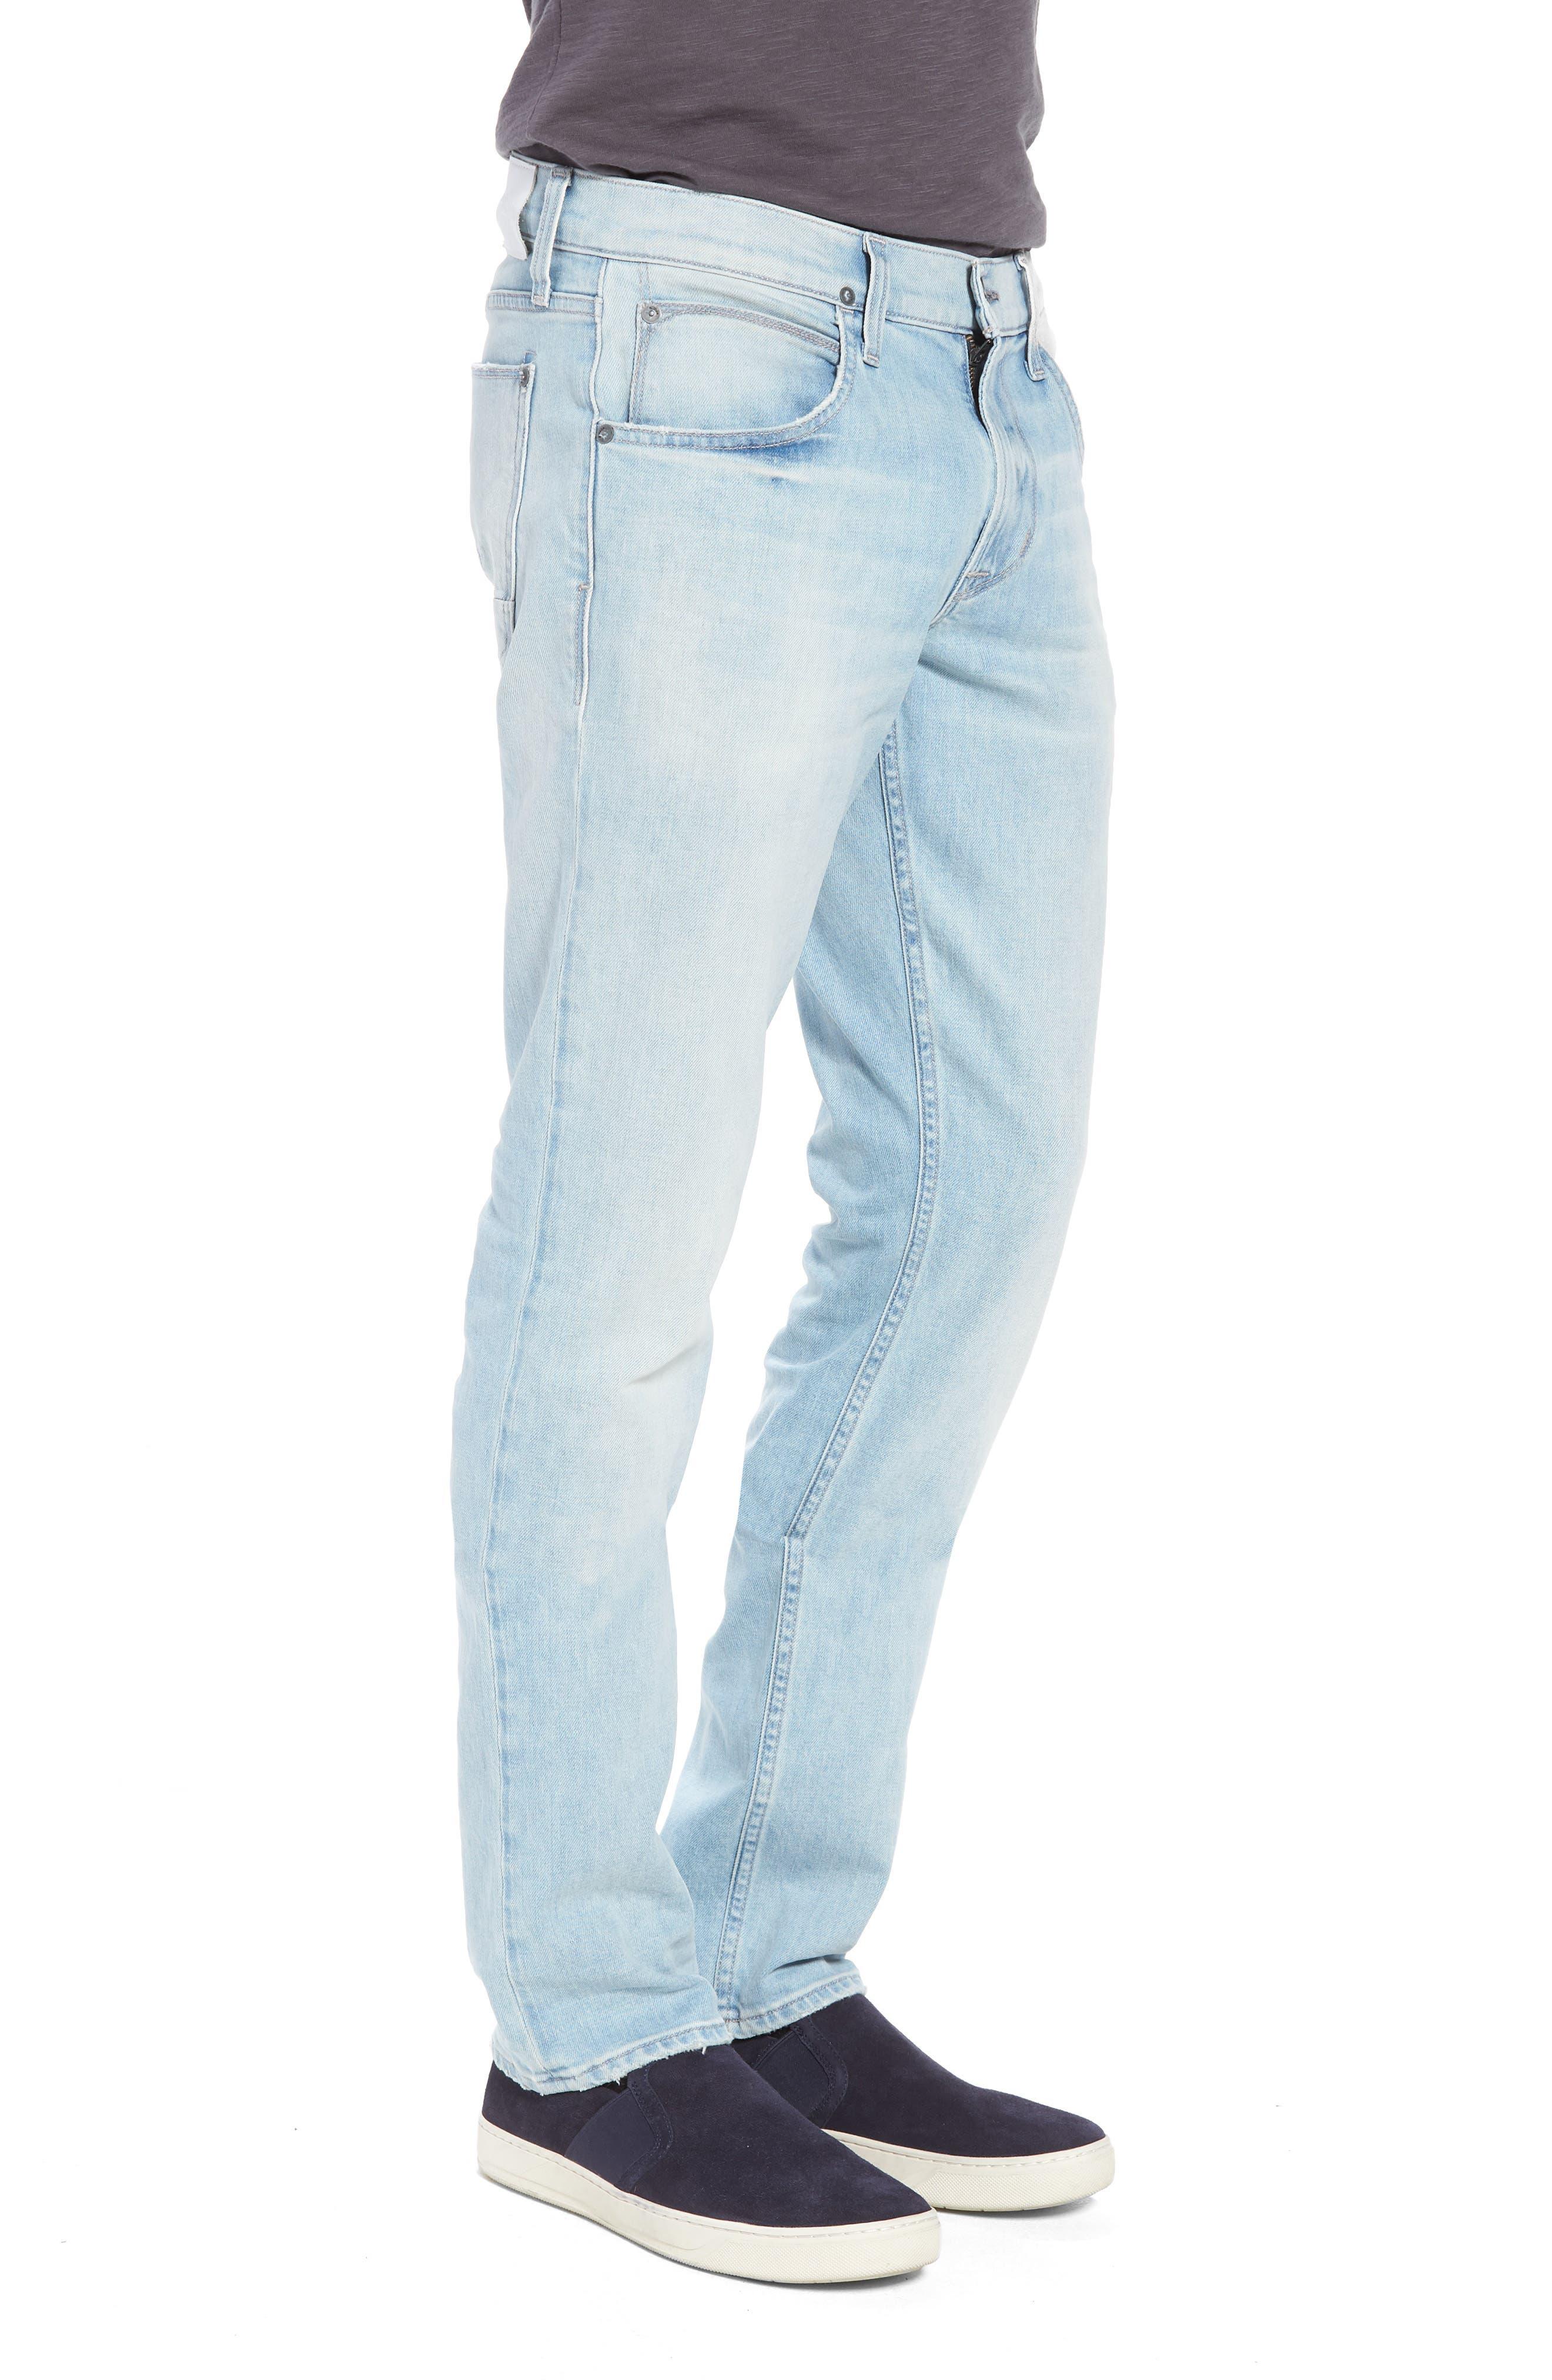 Blake Slim Fit Jeans,                             Alternate thumbnail 3, color,                             Rewired